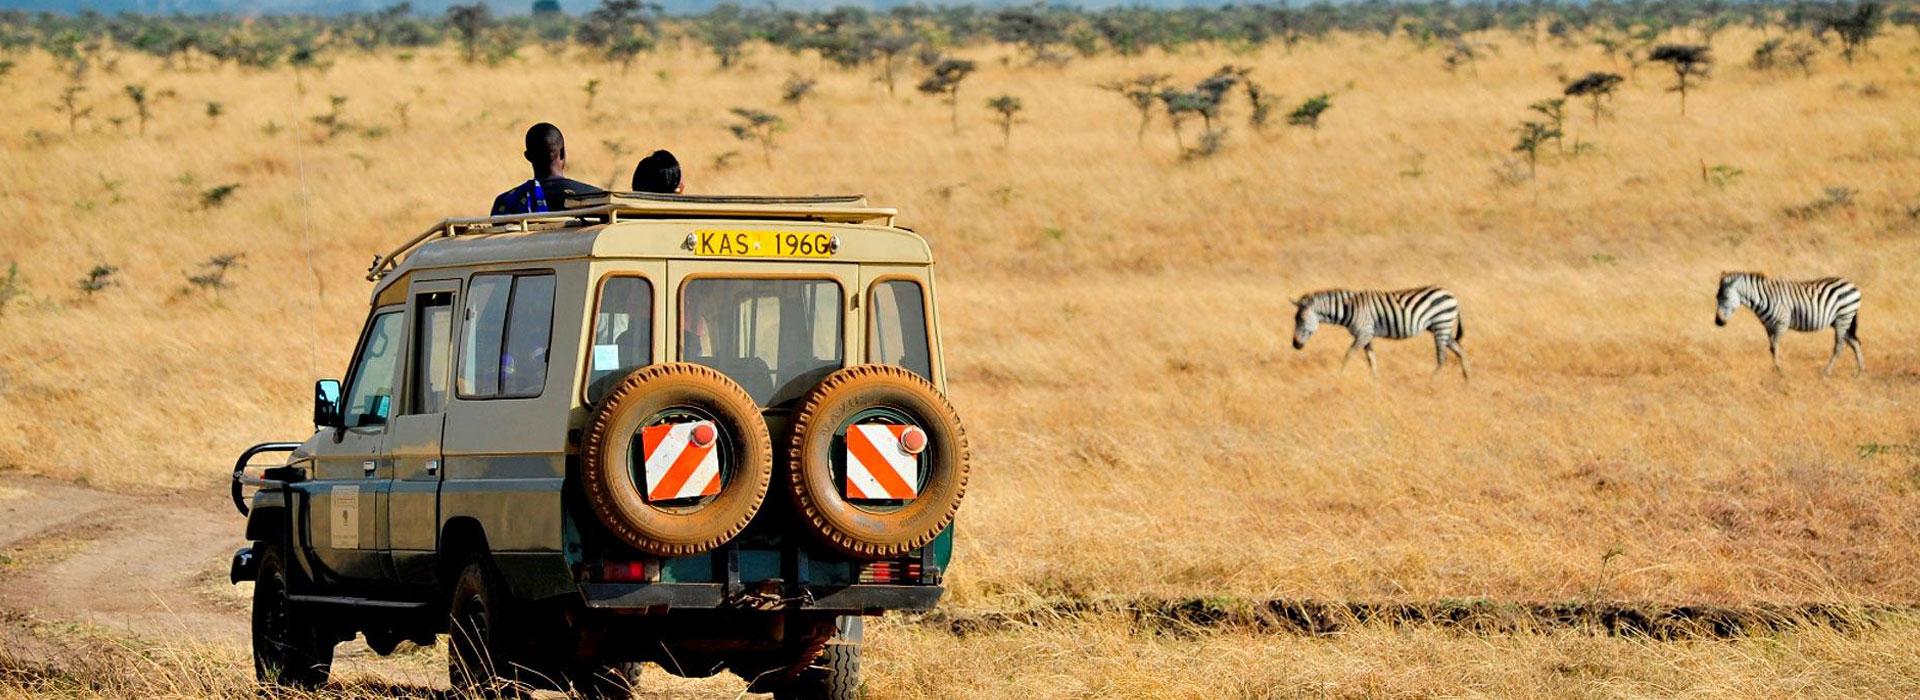 4 Days Nairobi to Nairobi Southern Circuit Safari